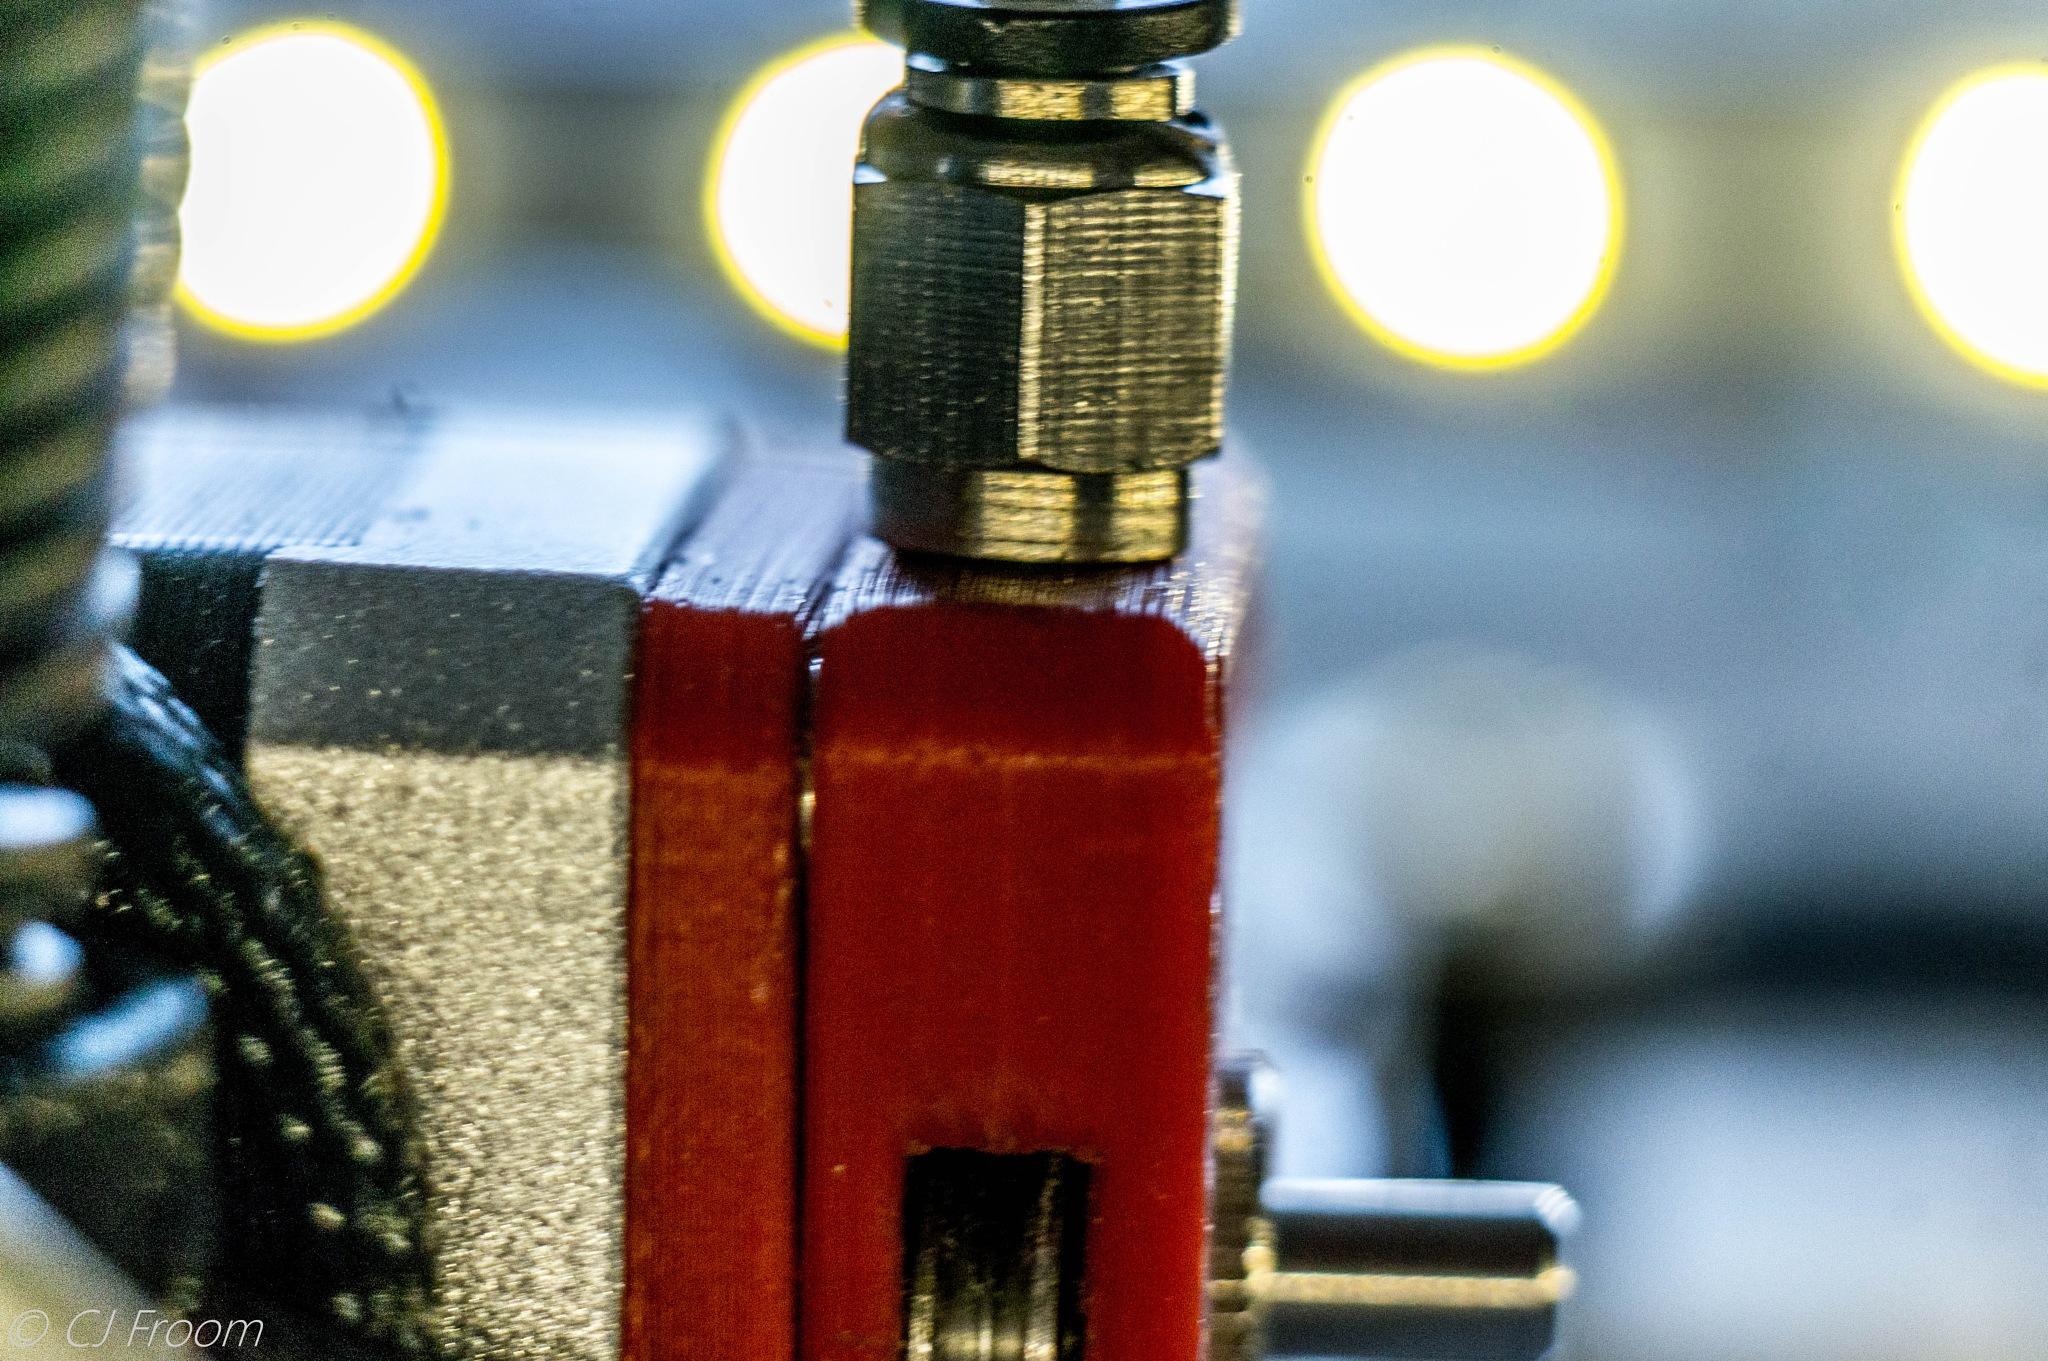 3D Printer Parts  by Cj Froom